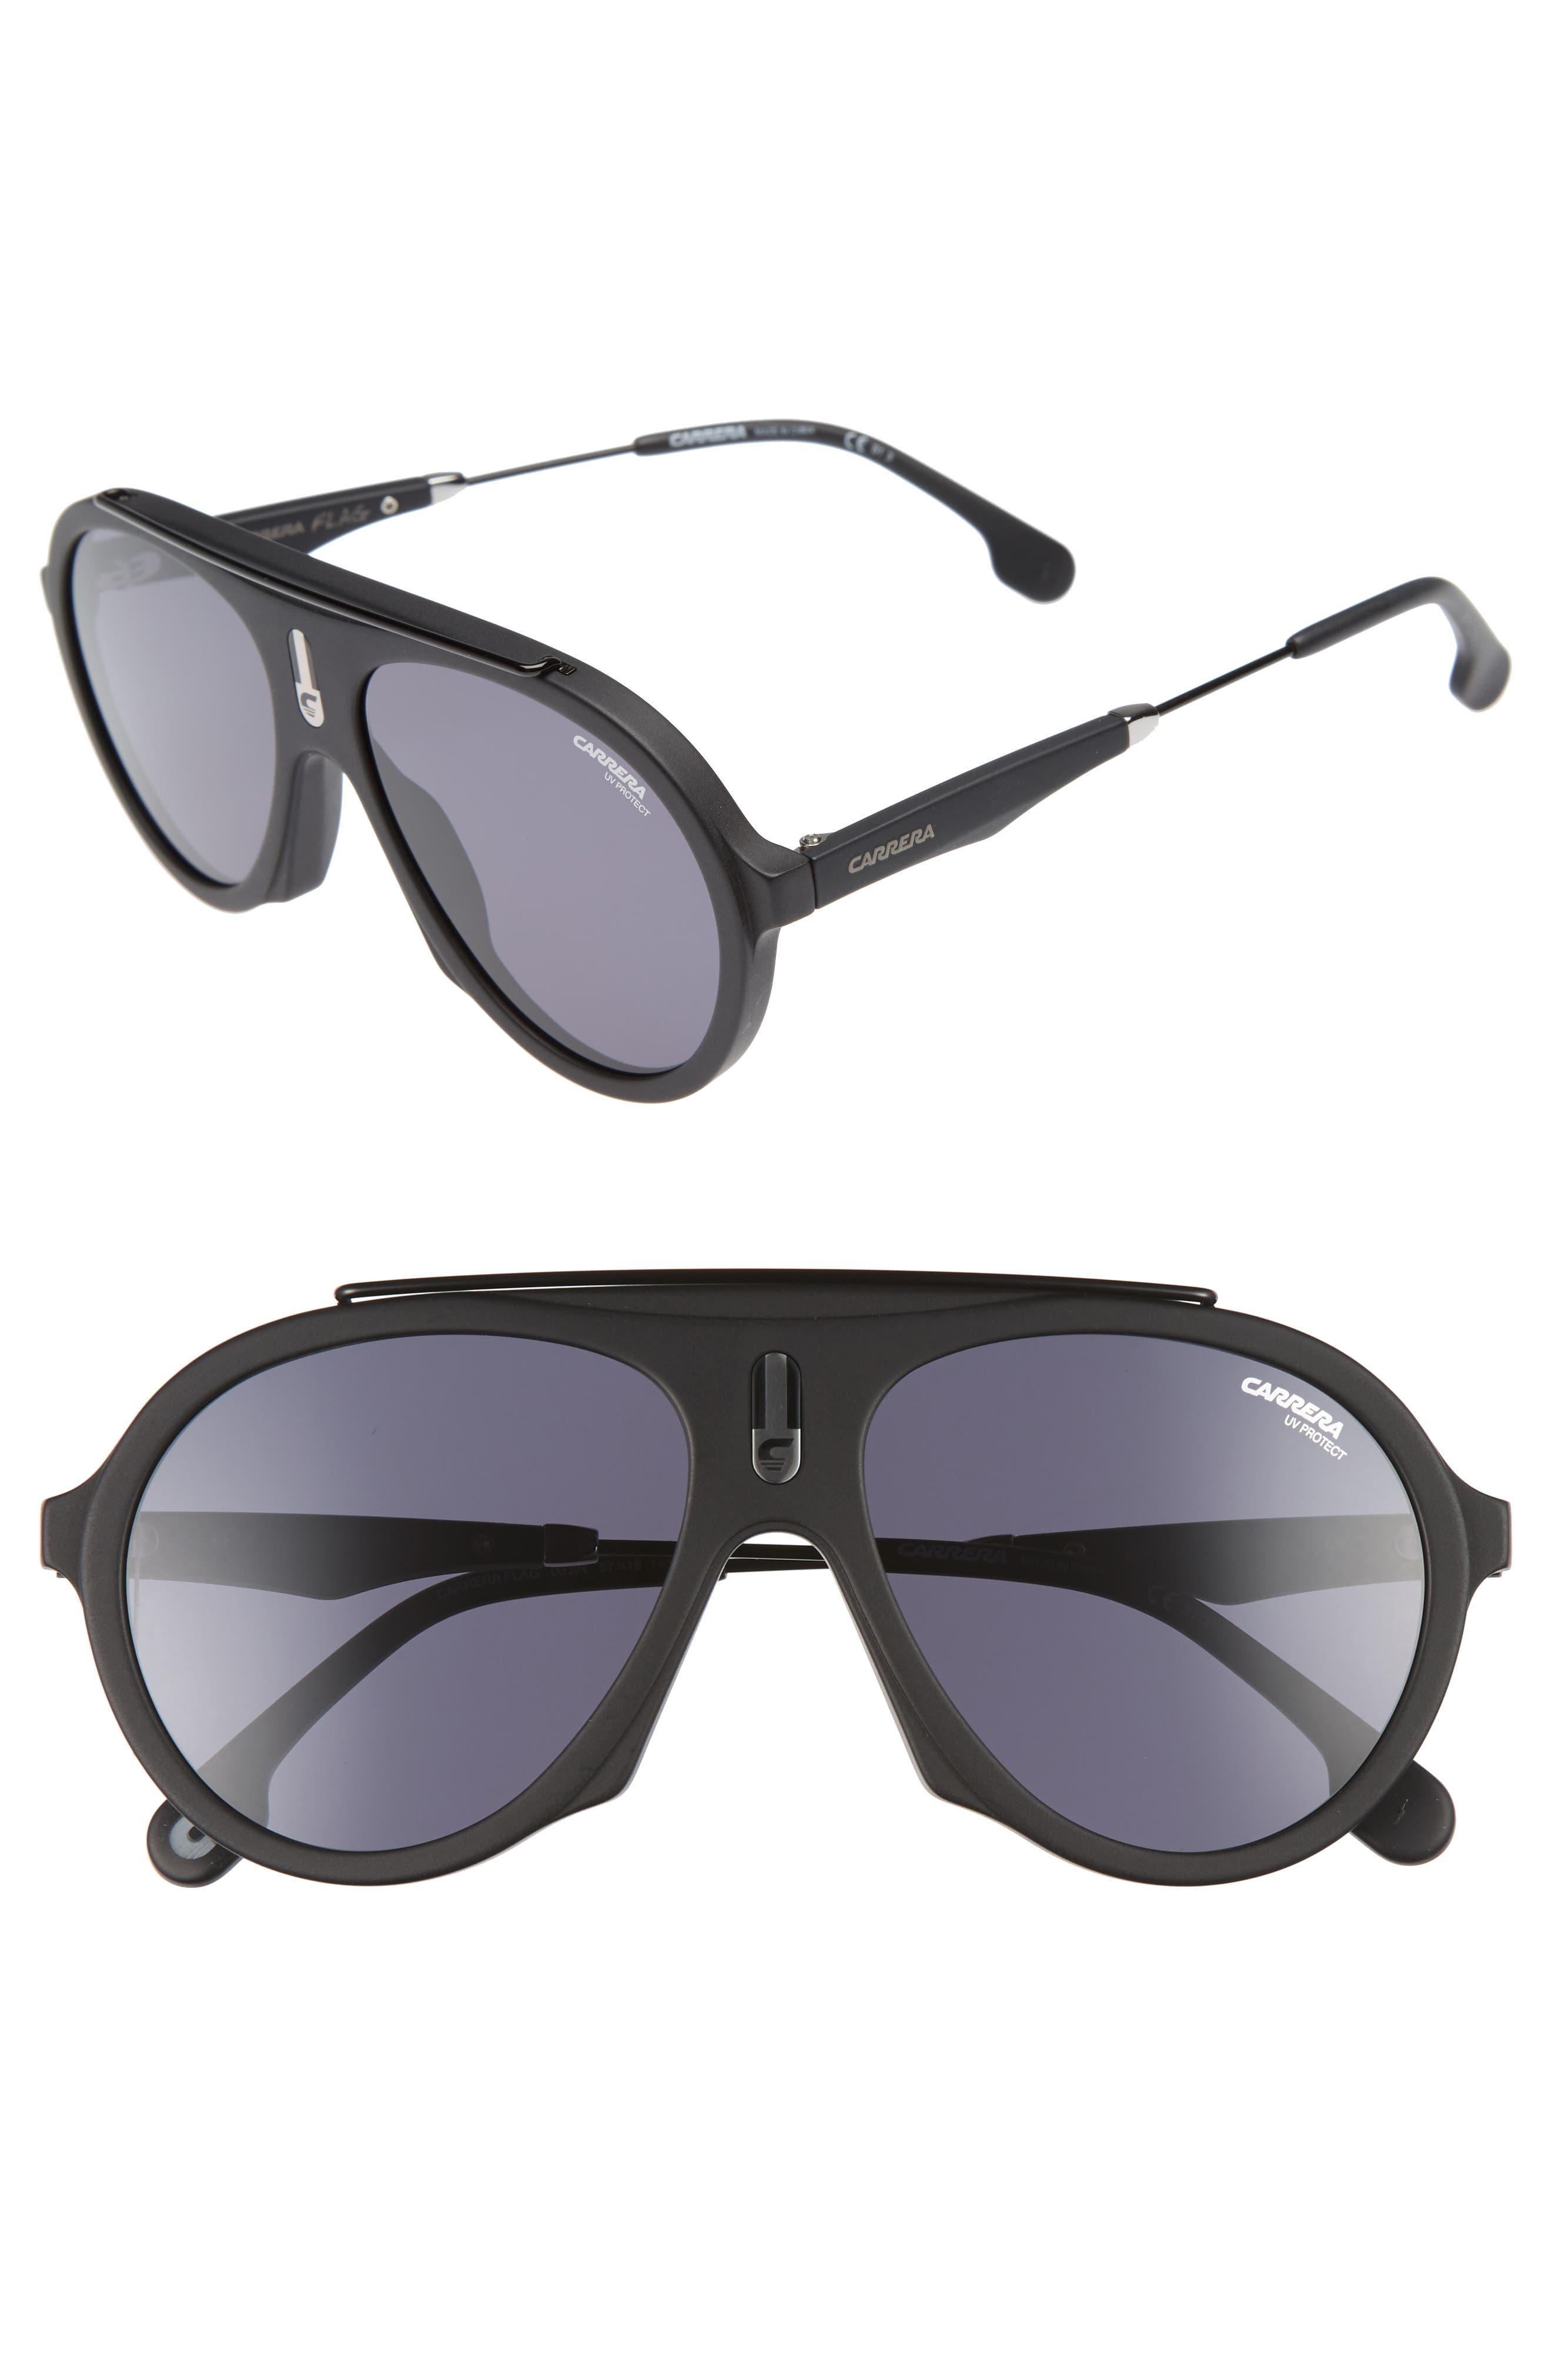 CARRERA EYEWEAR Carrera Flag 57mm Mirrored Pilot Sunglasses